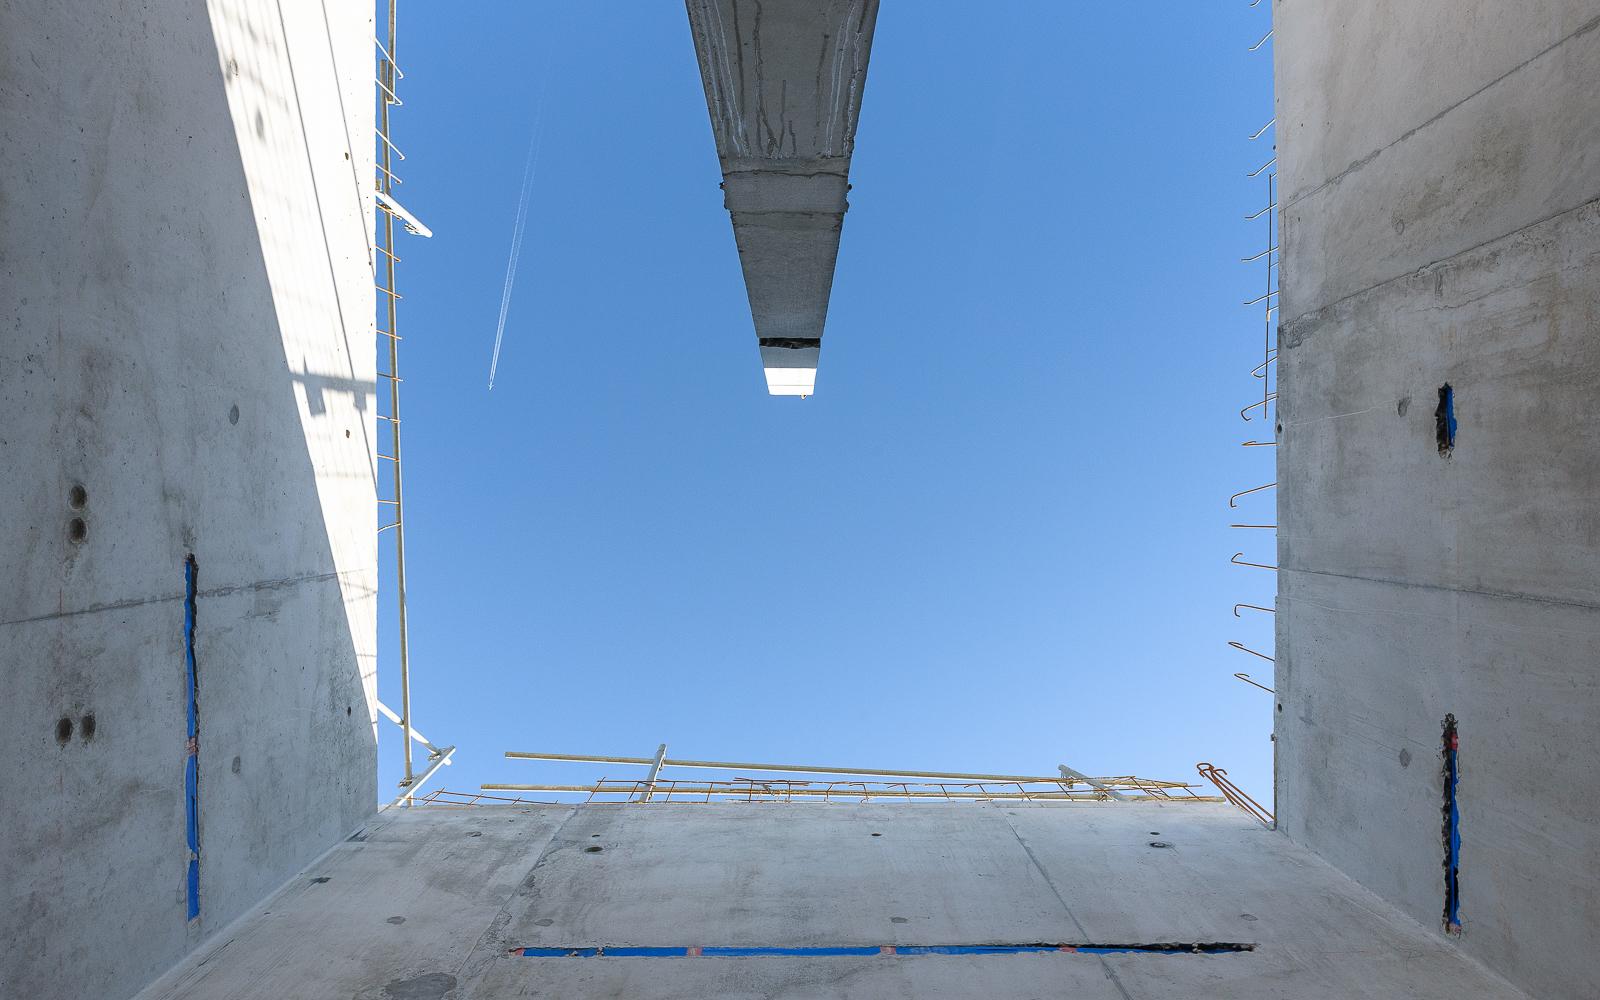 PAYSdeLOIRE-AIA-chantier-NsE-05-9-2